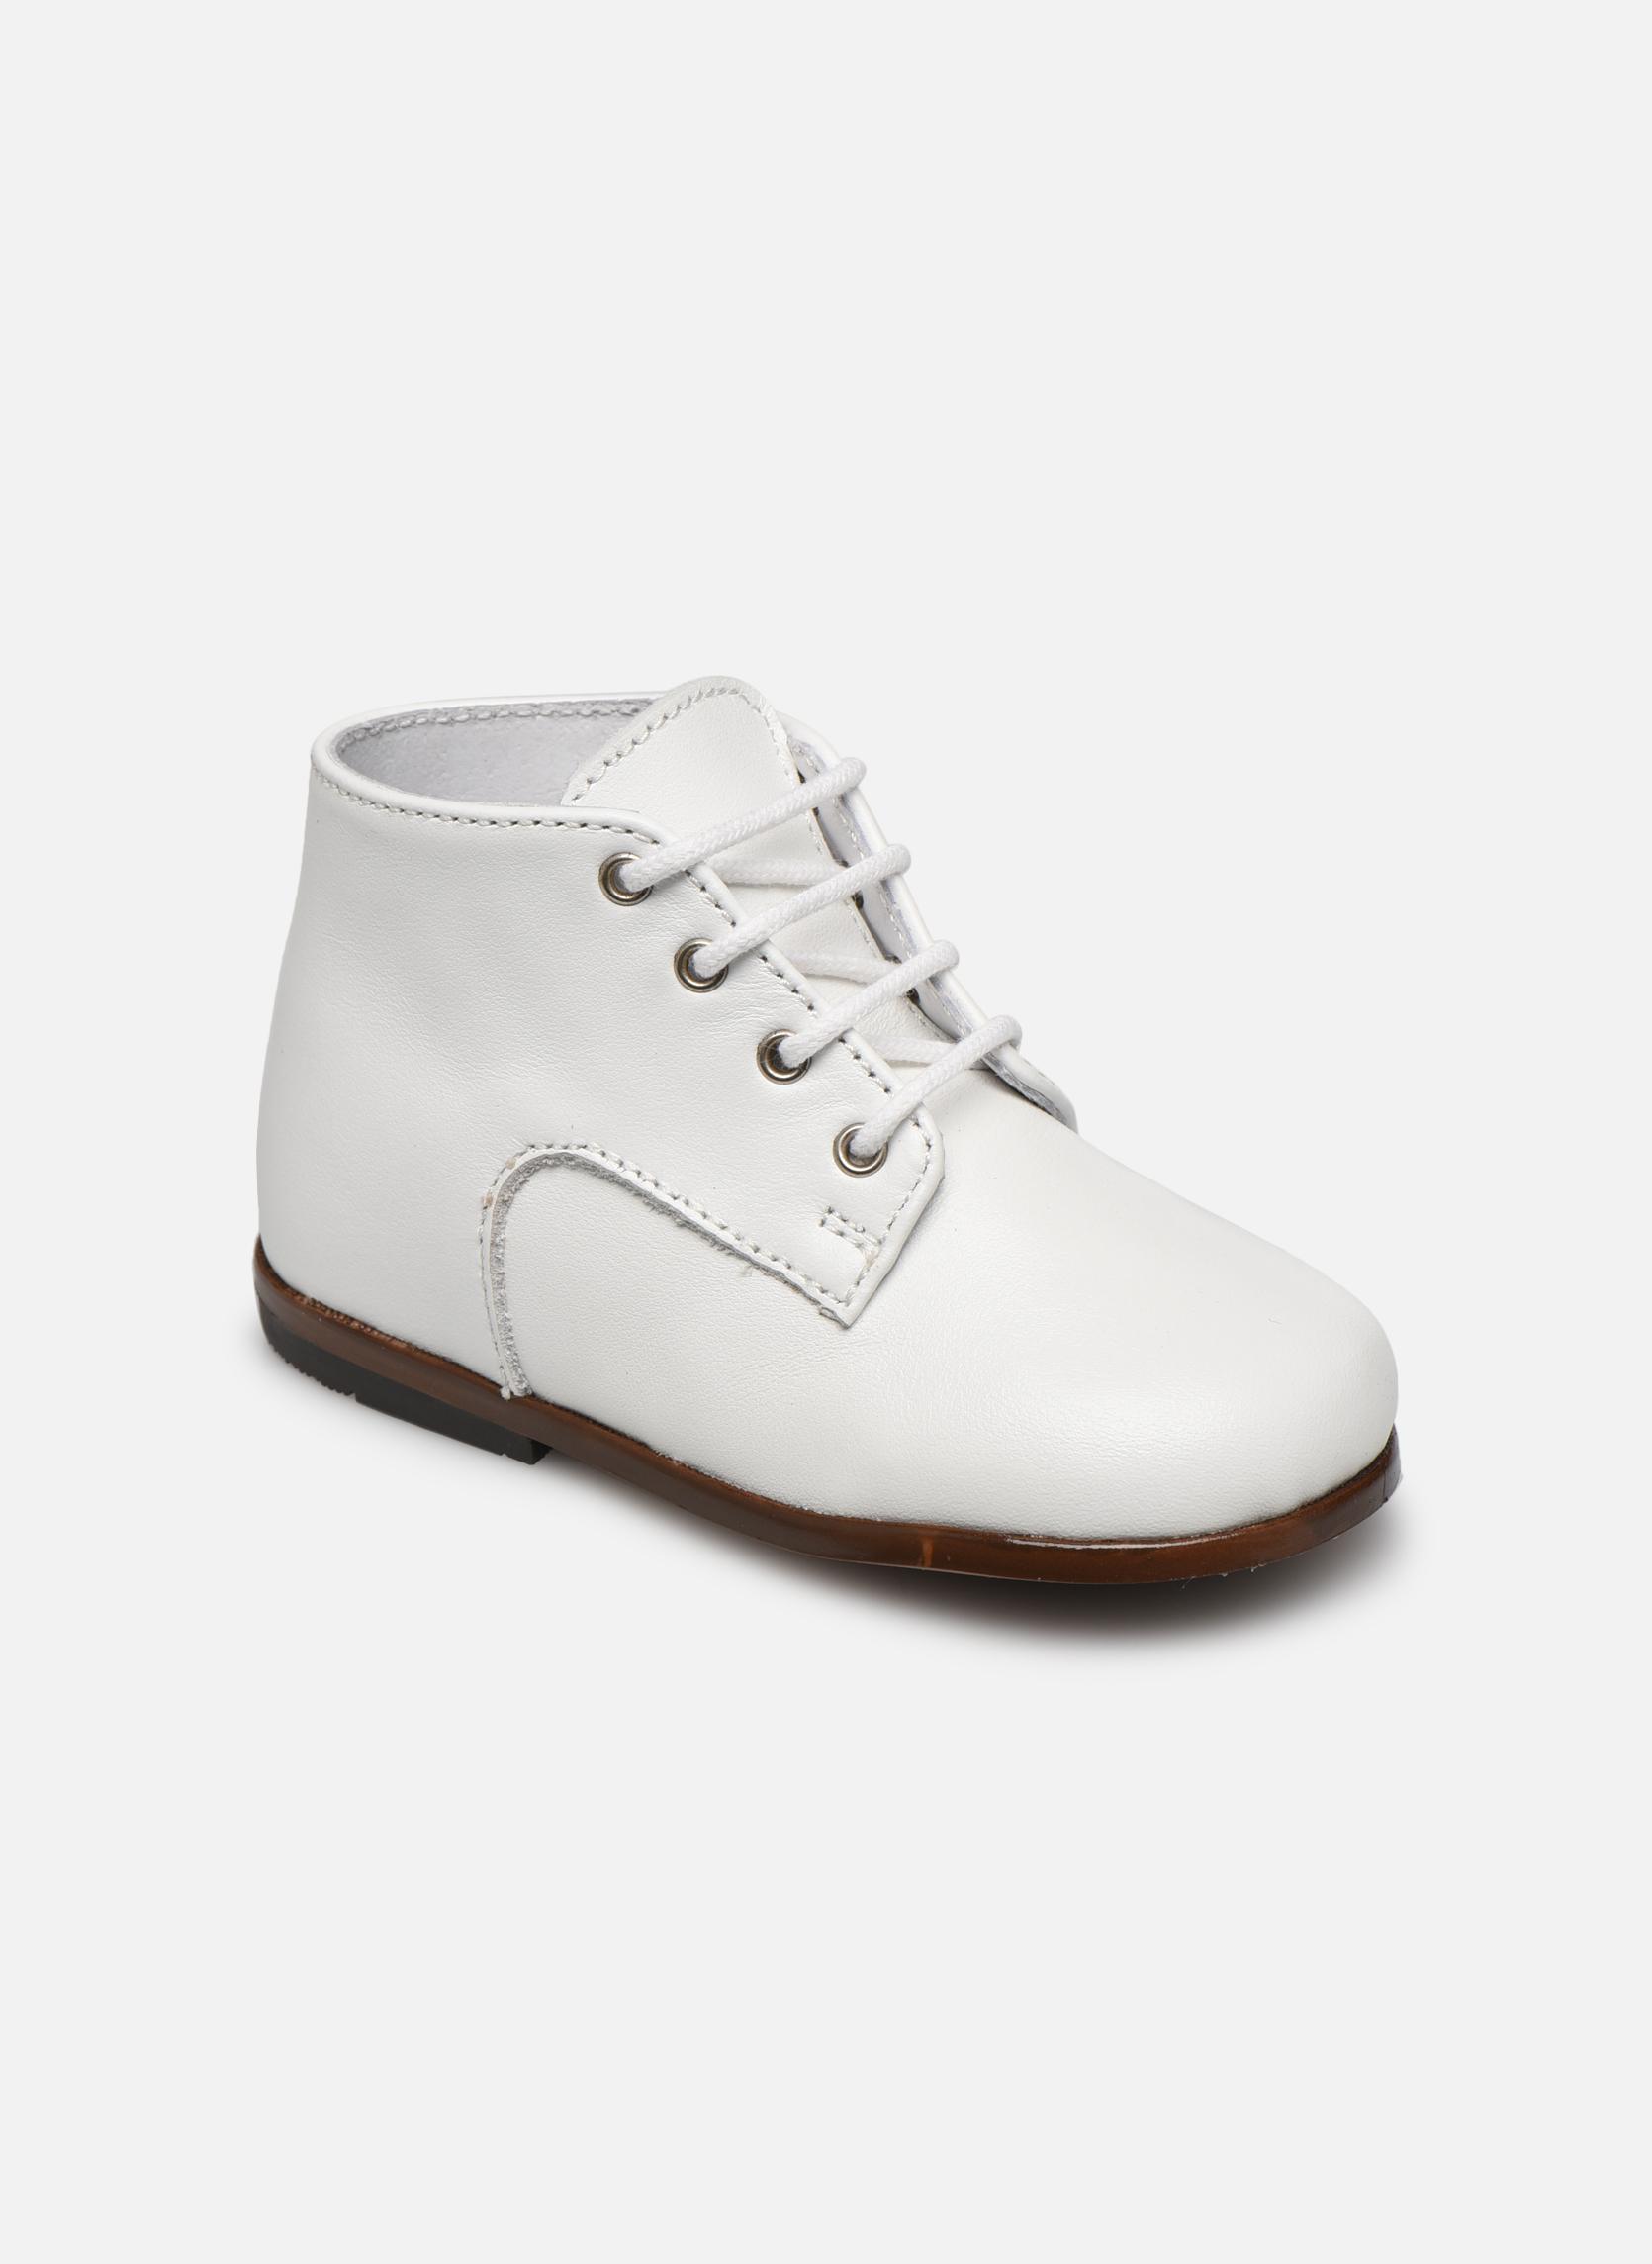 Vachette blanche